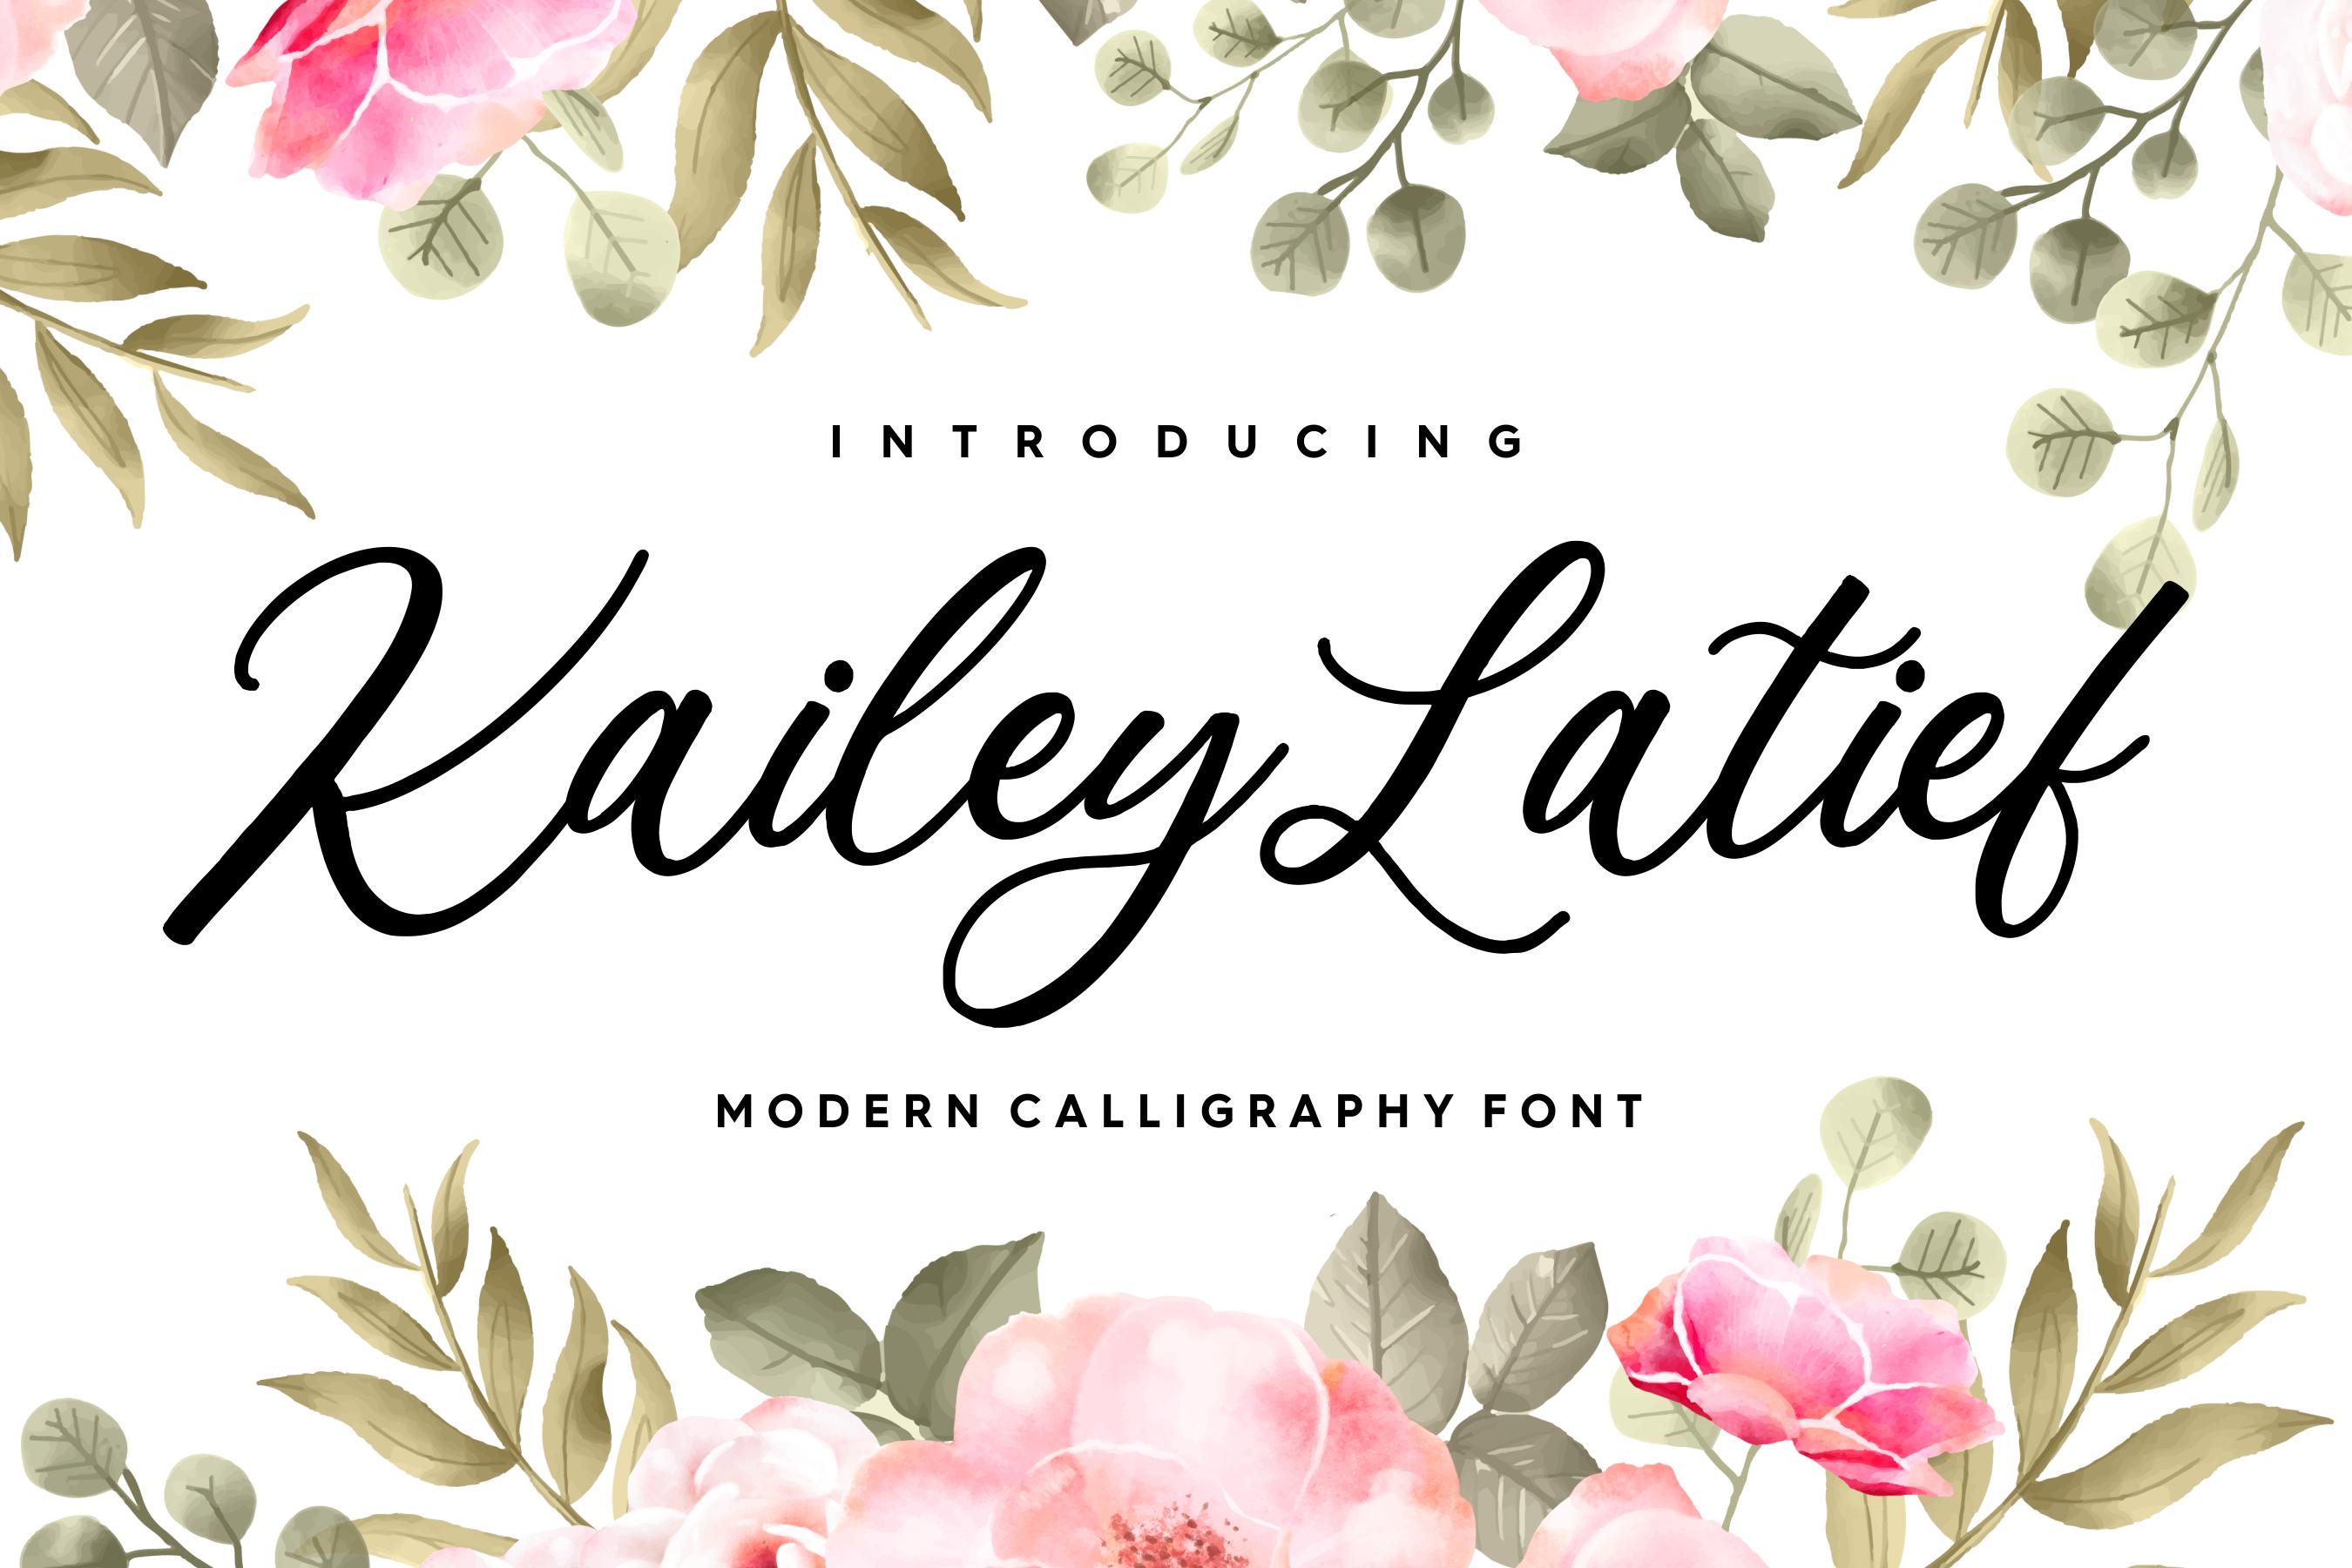 Kailey Latief Modern Calligraphy Font By Balpirick Studio